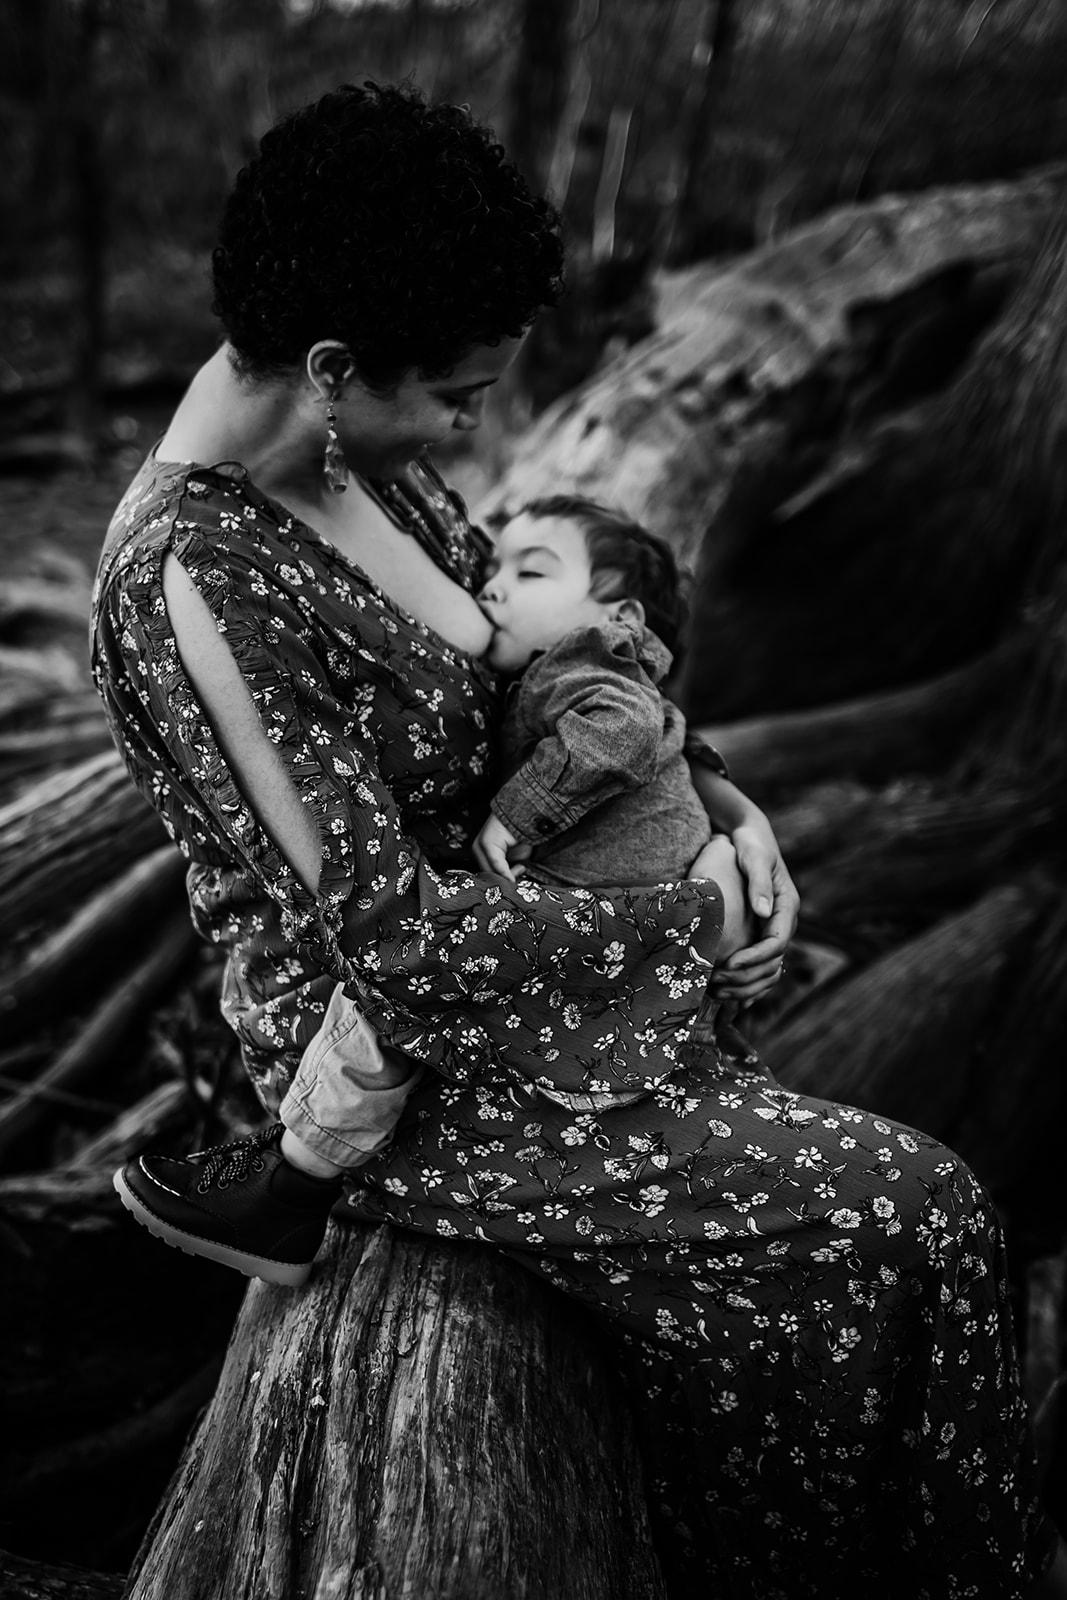 Milena-San-Antonio-Birth-Photographer-6.jpg